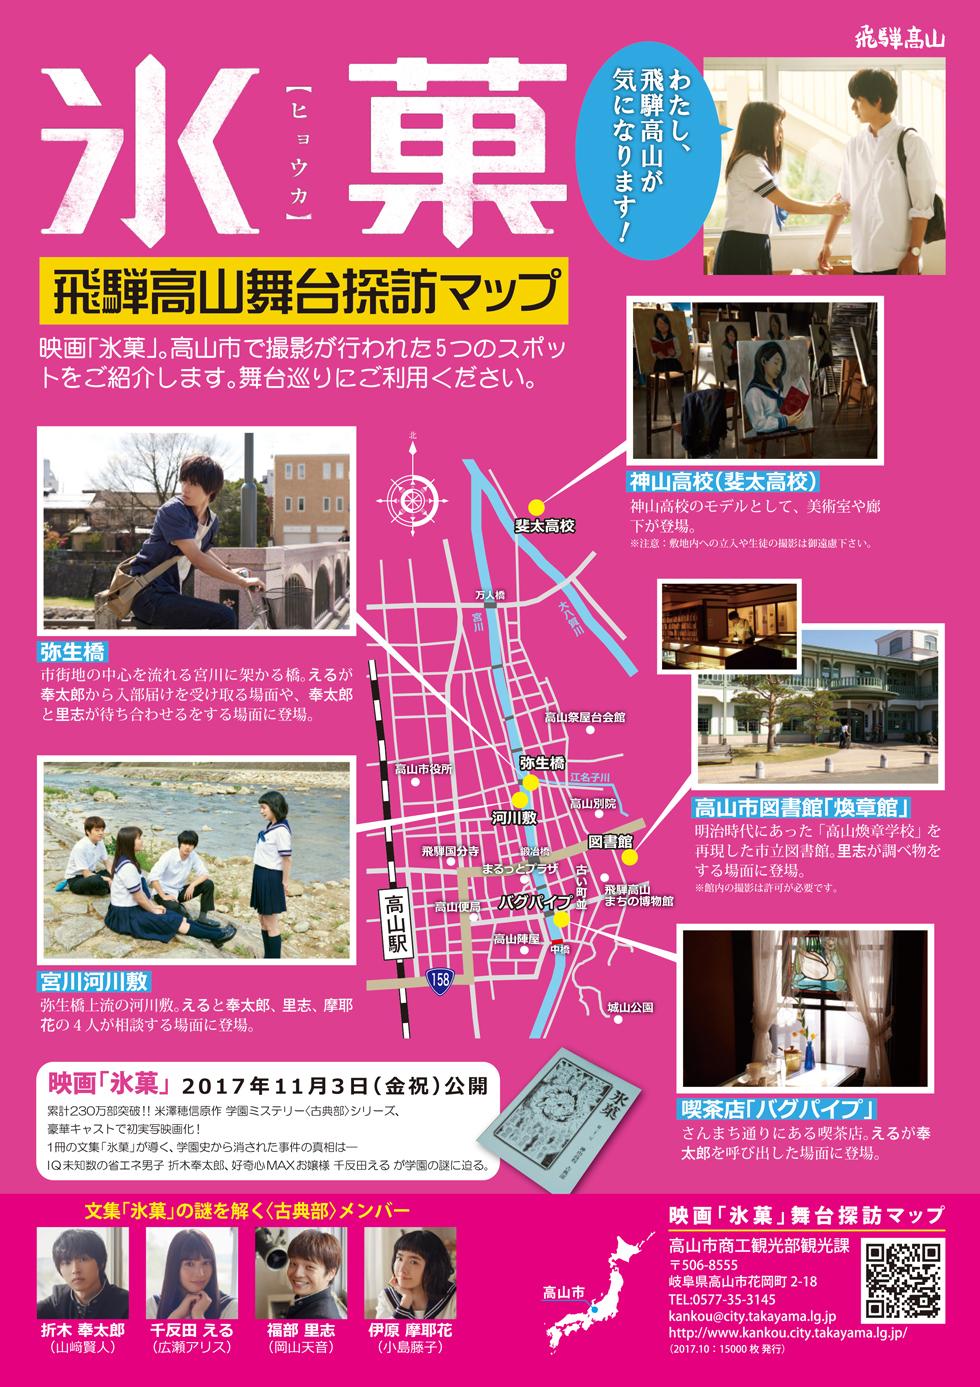 映画『氷菓』舞台探訪マップ(裏)